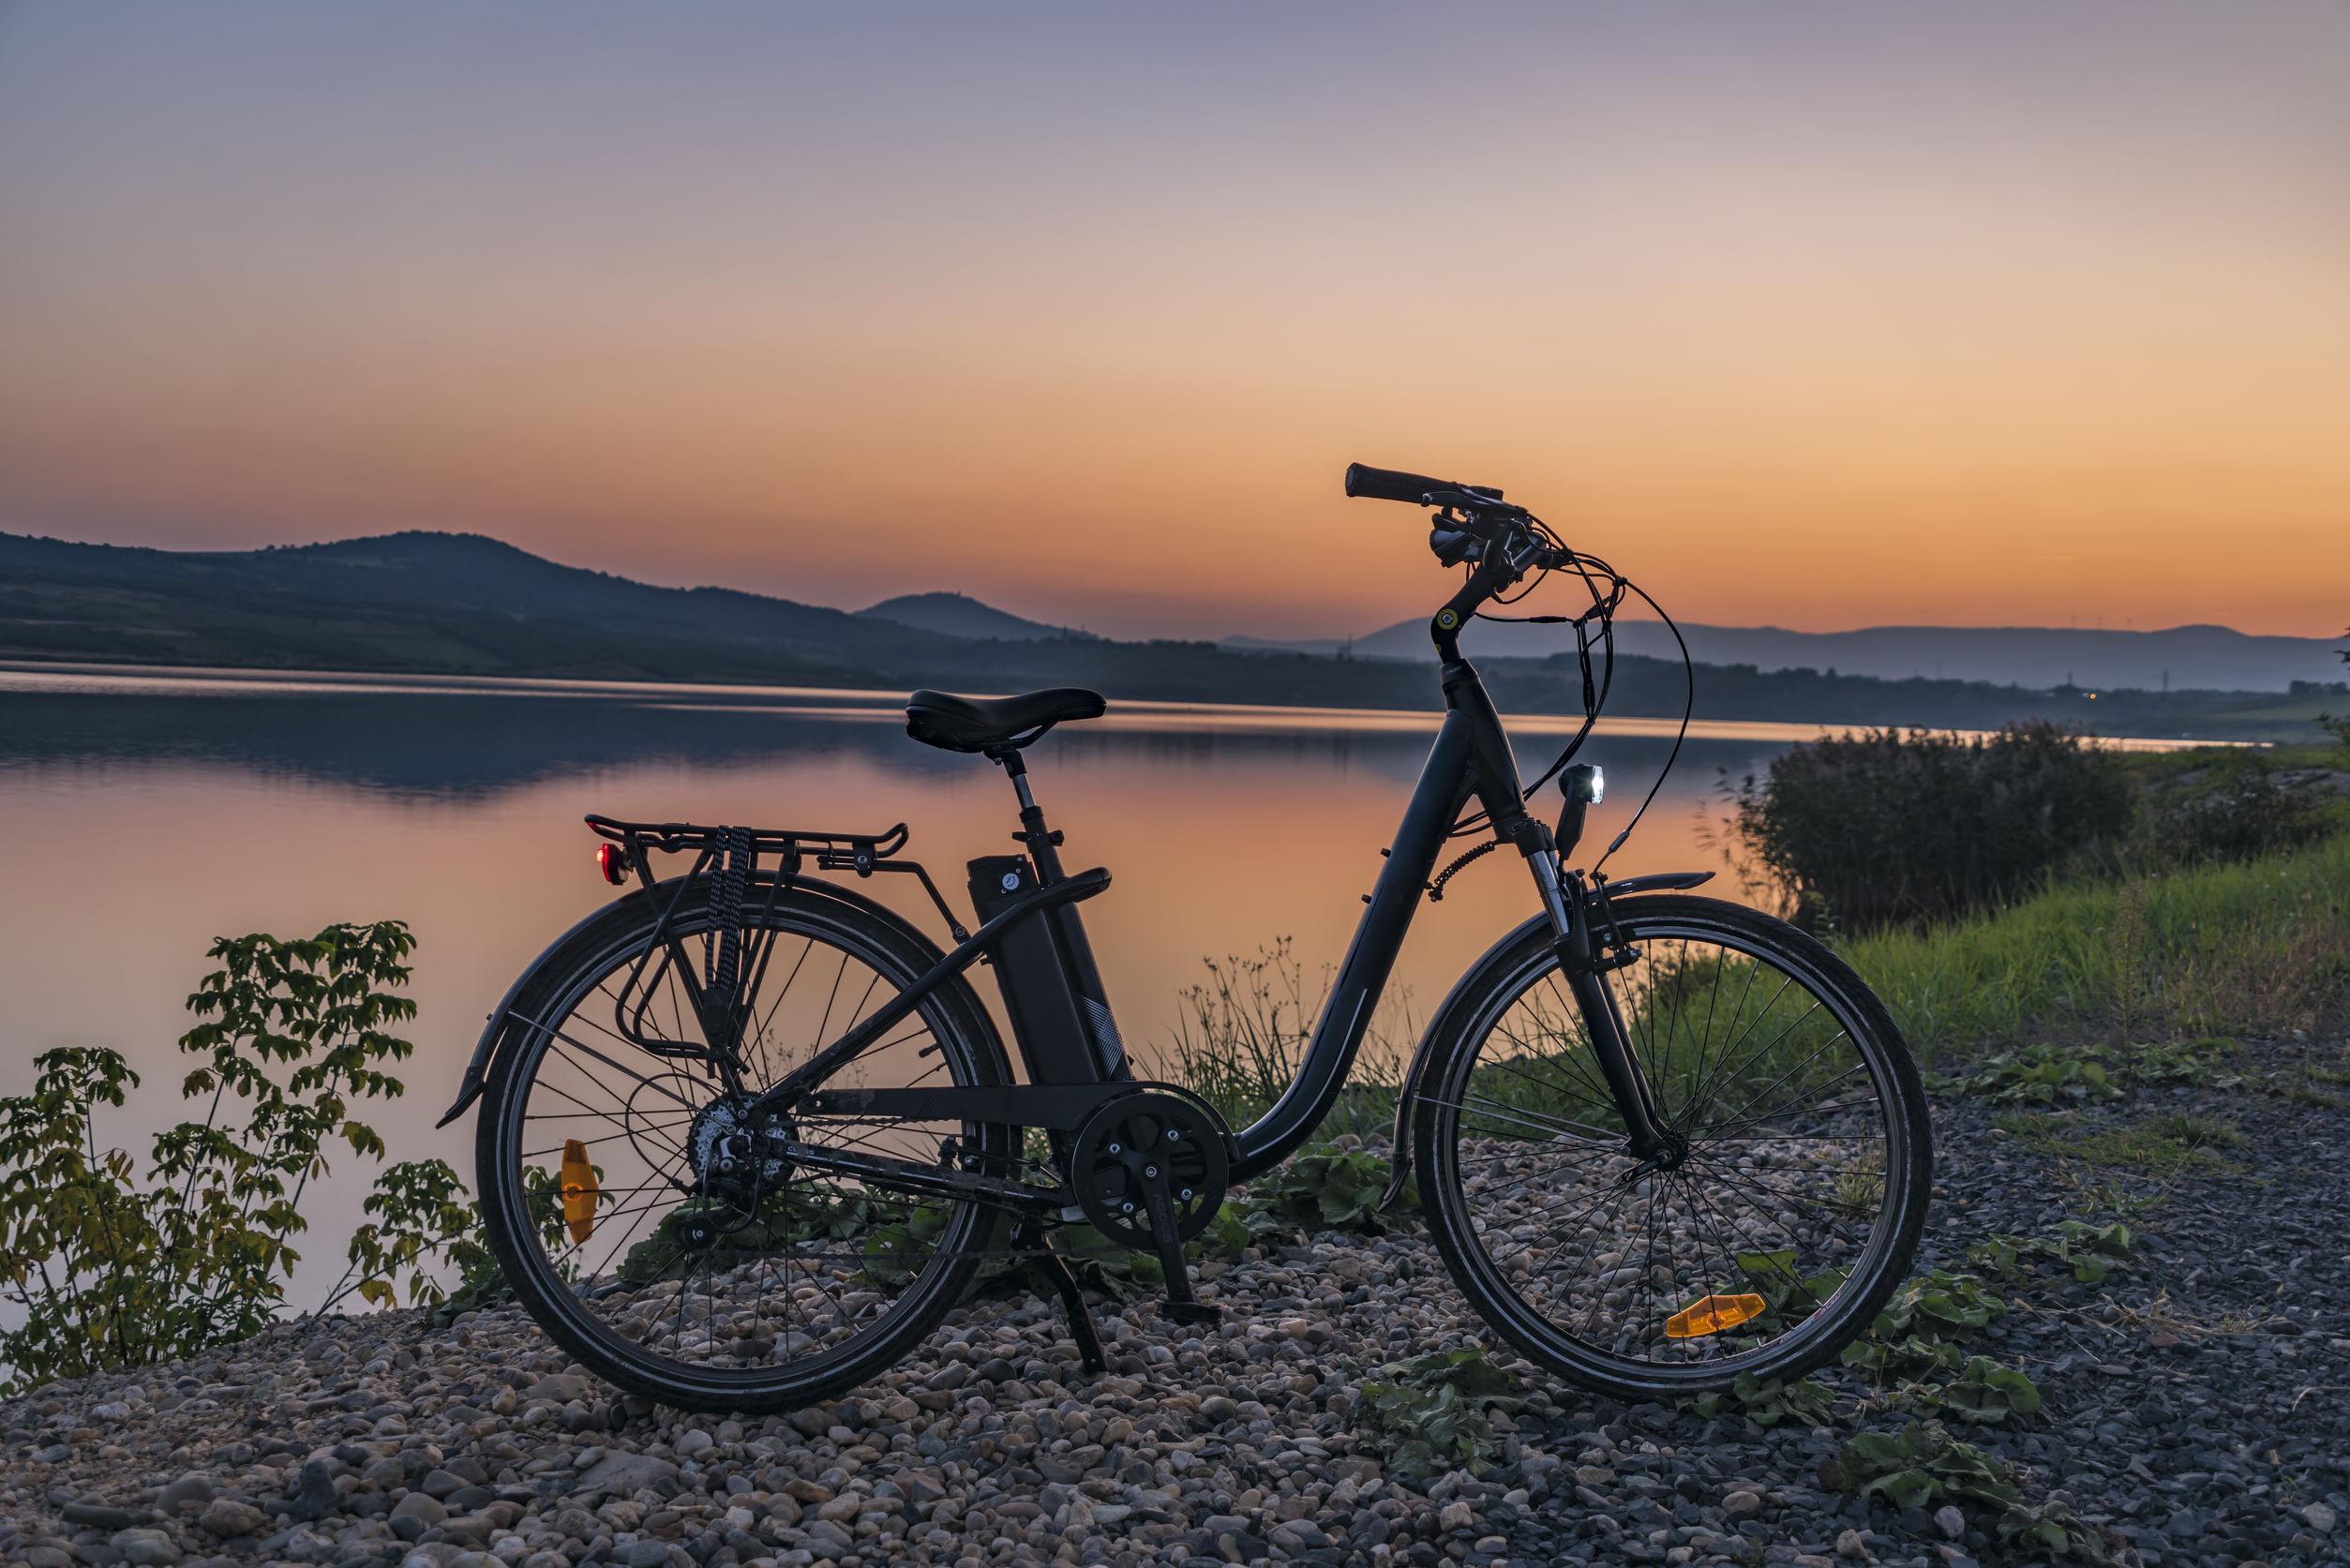 faróis de bicicleta à noite